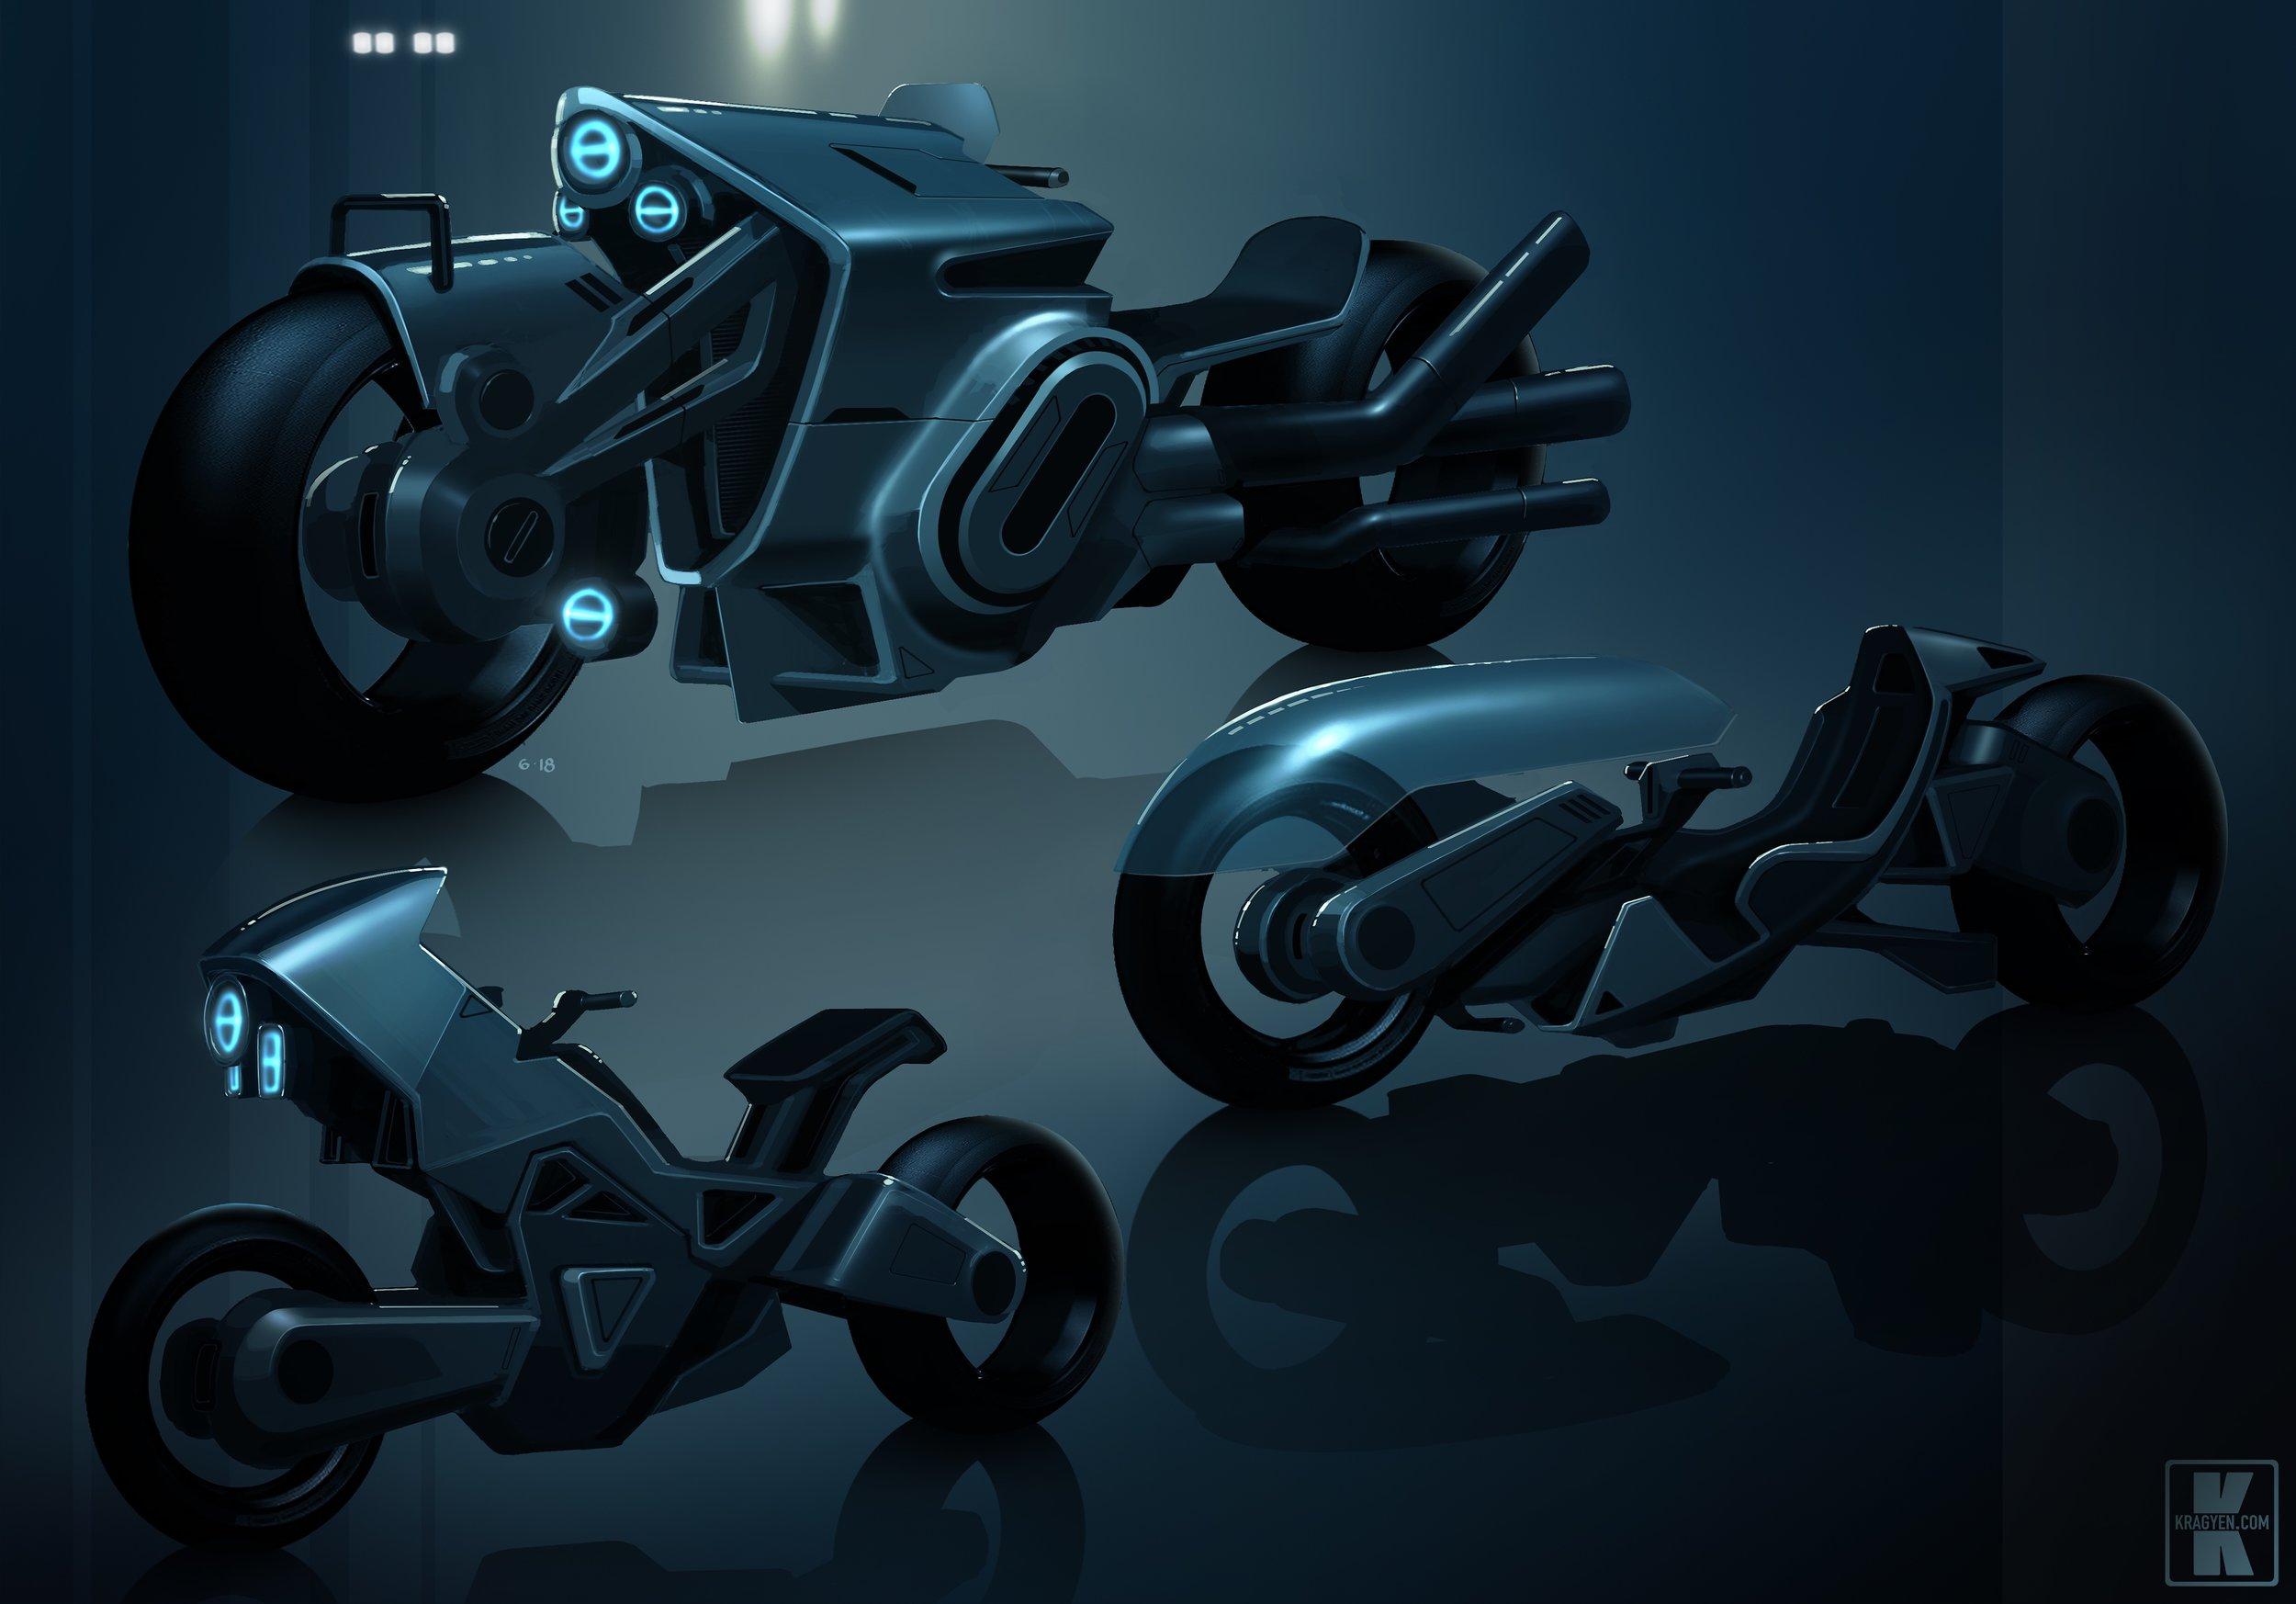 CyberpunkMotorcycles.jpg